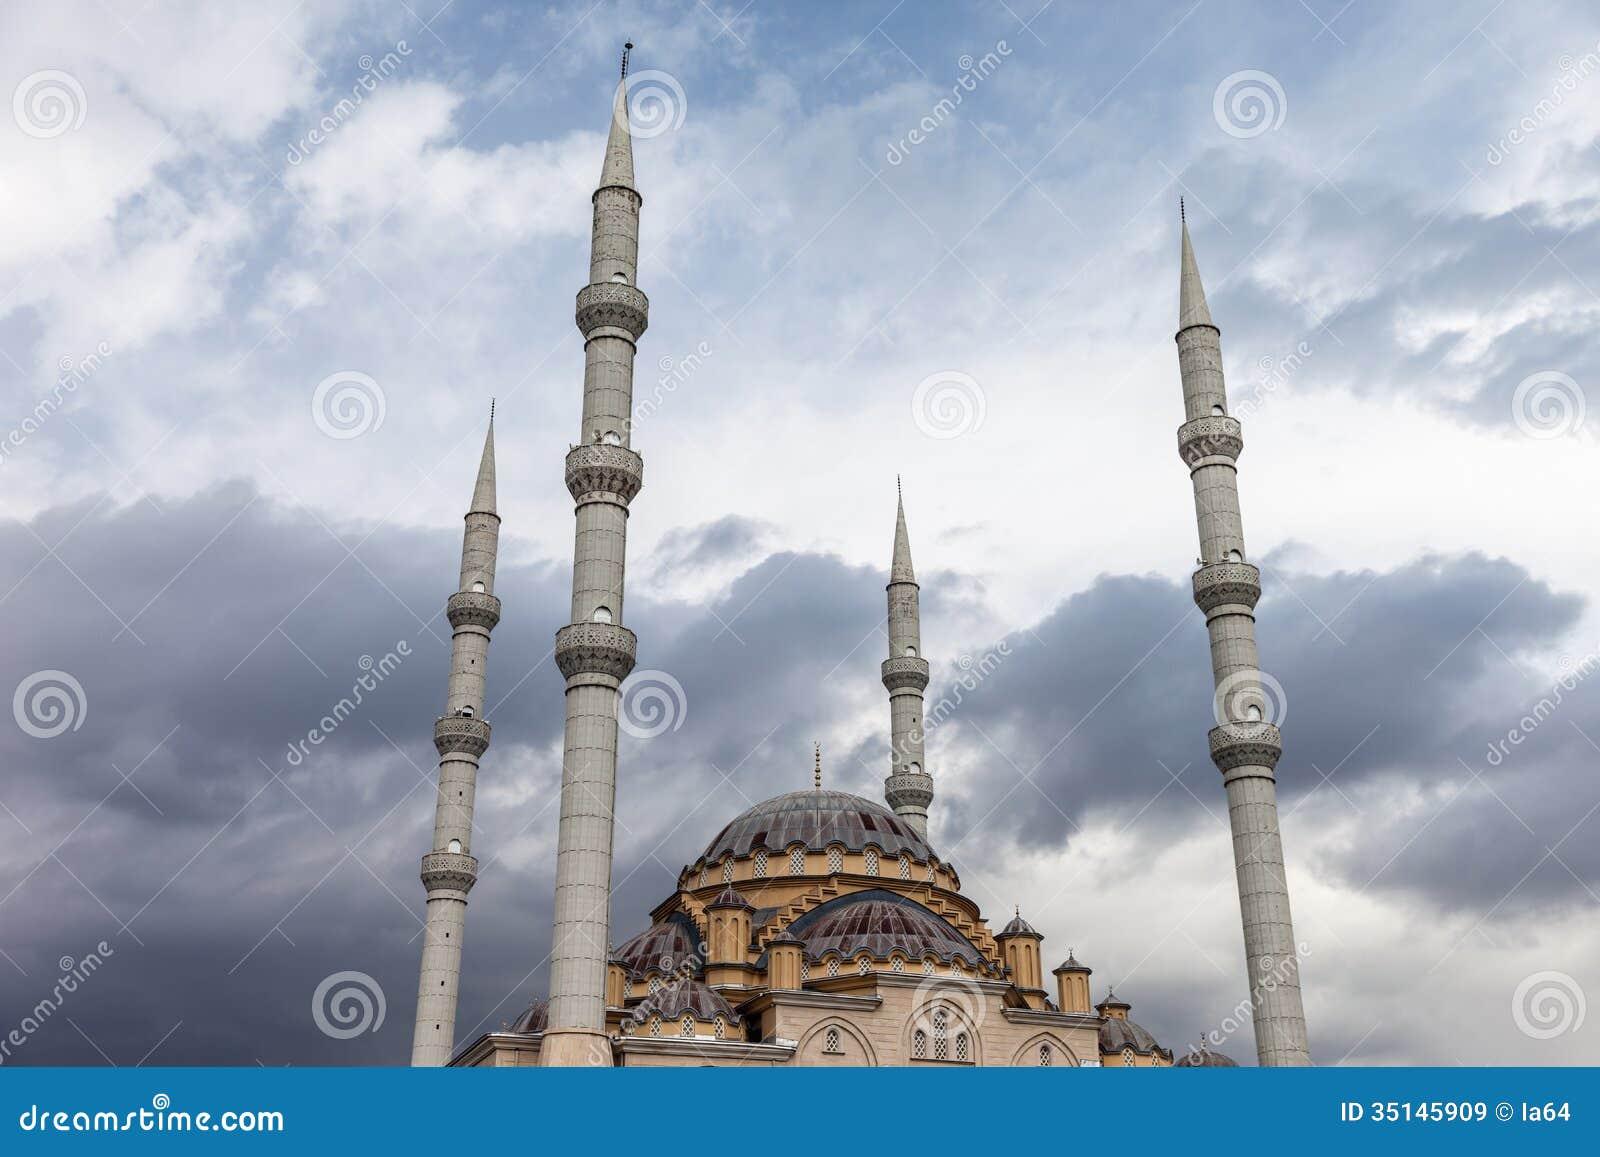 turkey city muslim Erdogan wants to restore the temple mount to muslim rule - erdogan's turkey intensifies involvement in gaza and jerusalem - pinhas inbari.